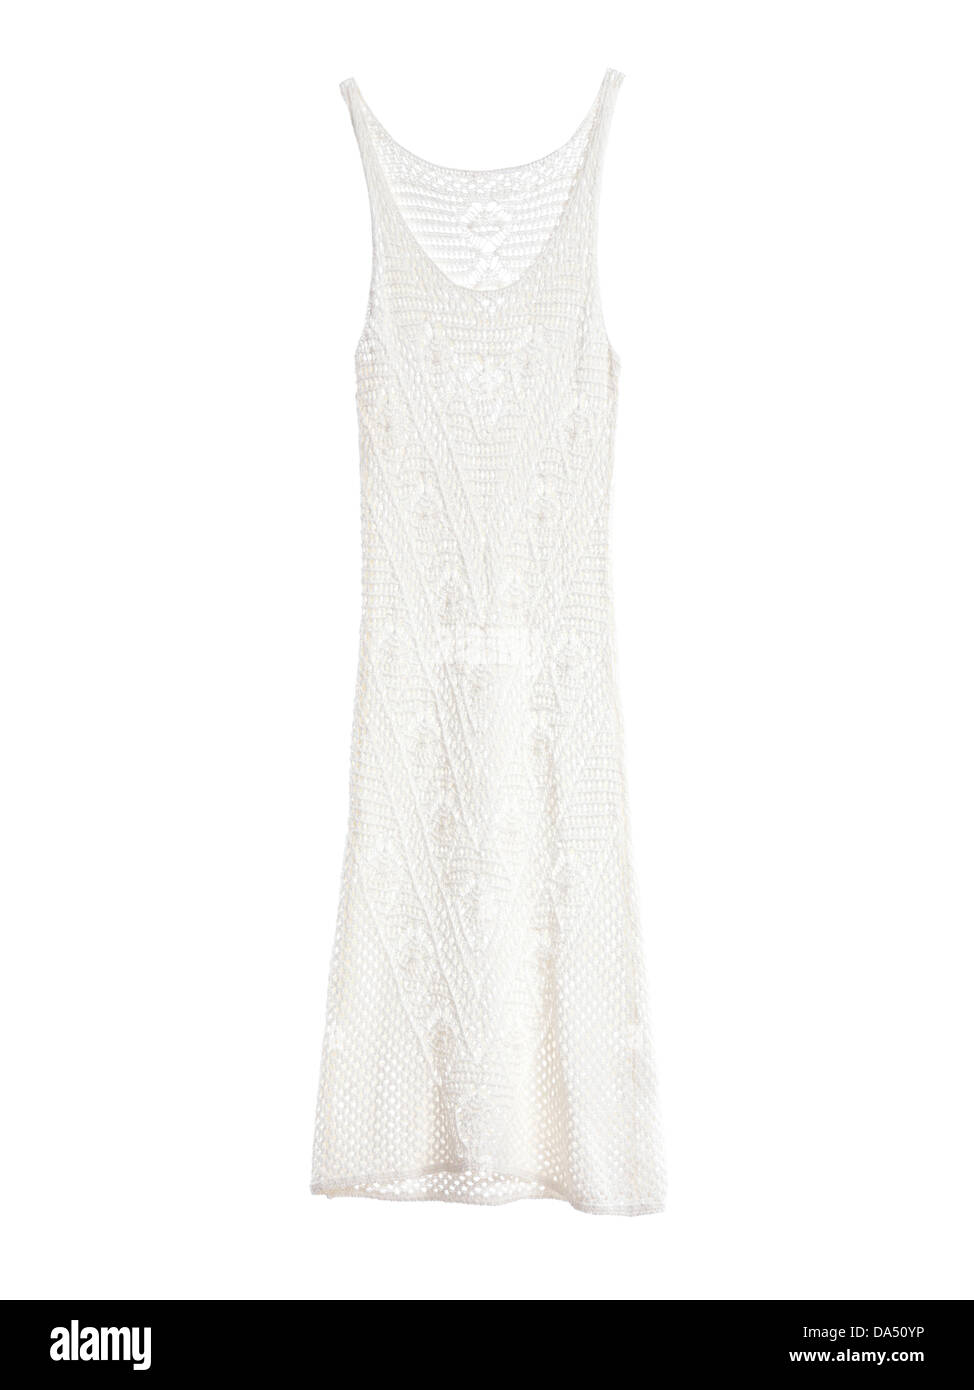 White crochet summer dress isolated on white background - Stock Image